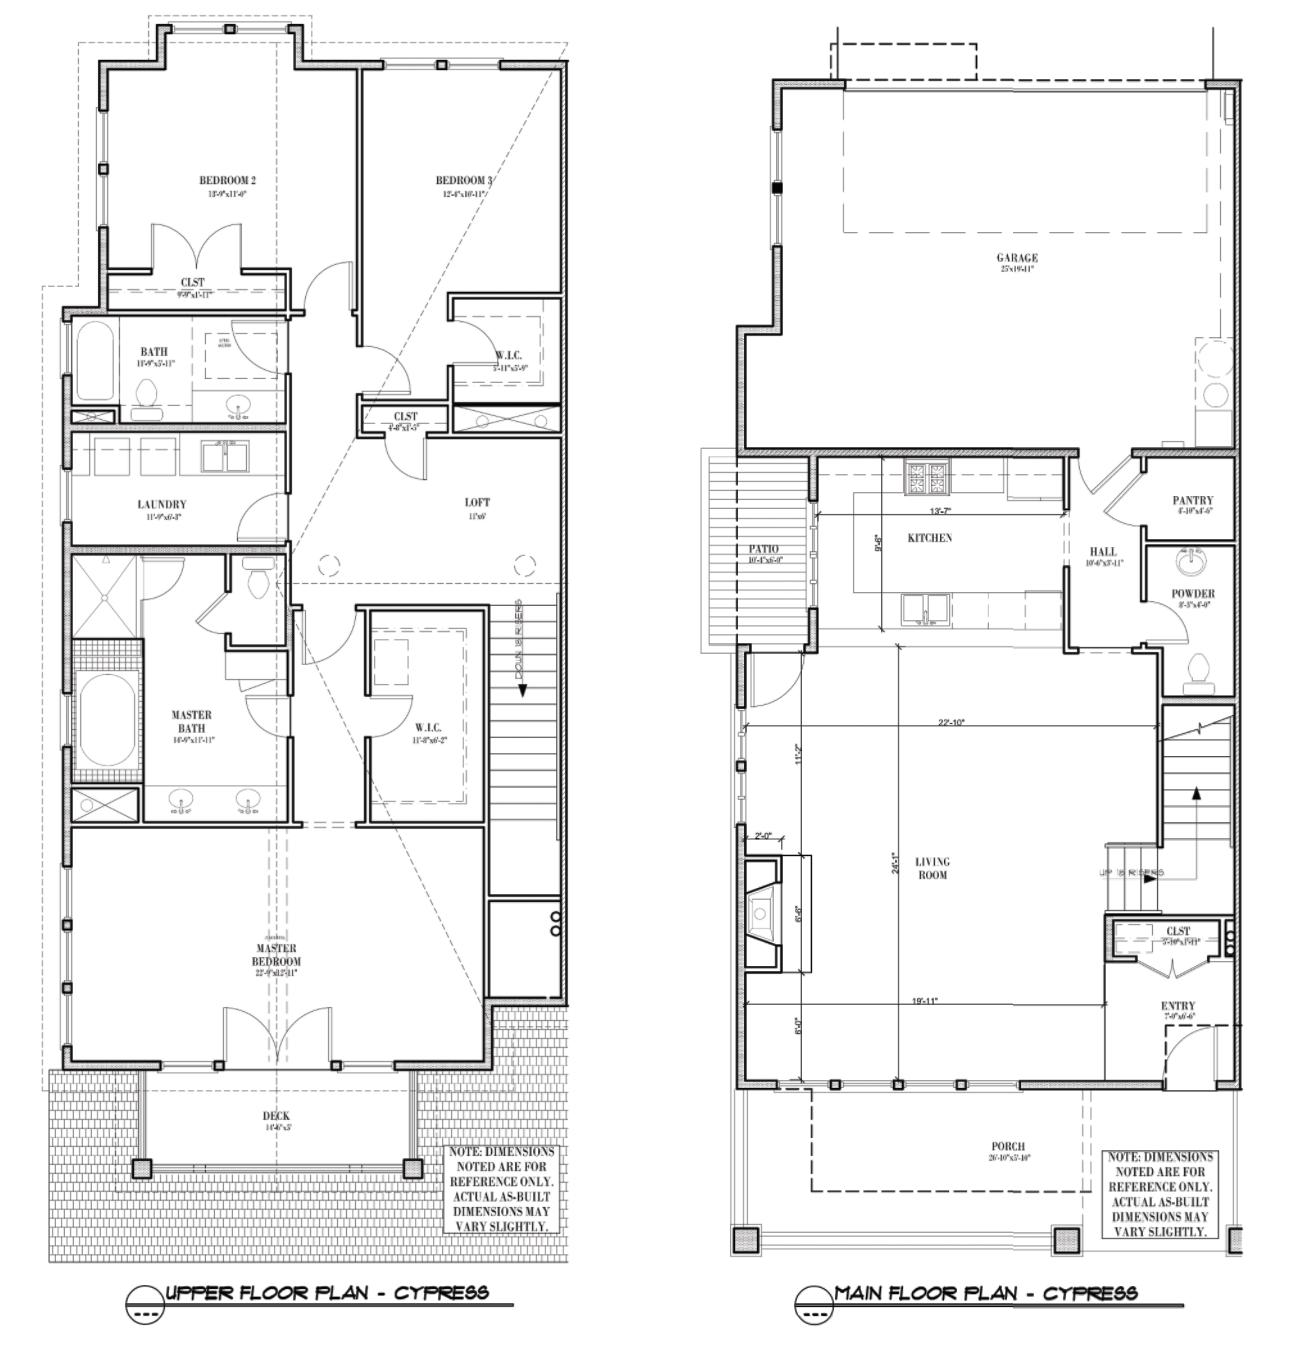 2crks-cypress-floor-plans.png